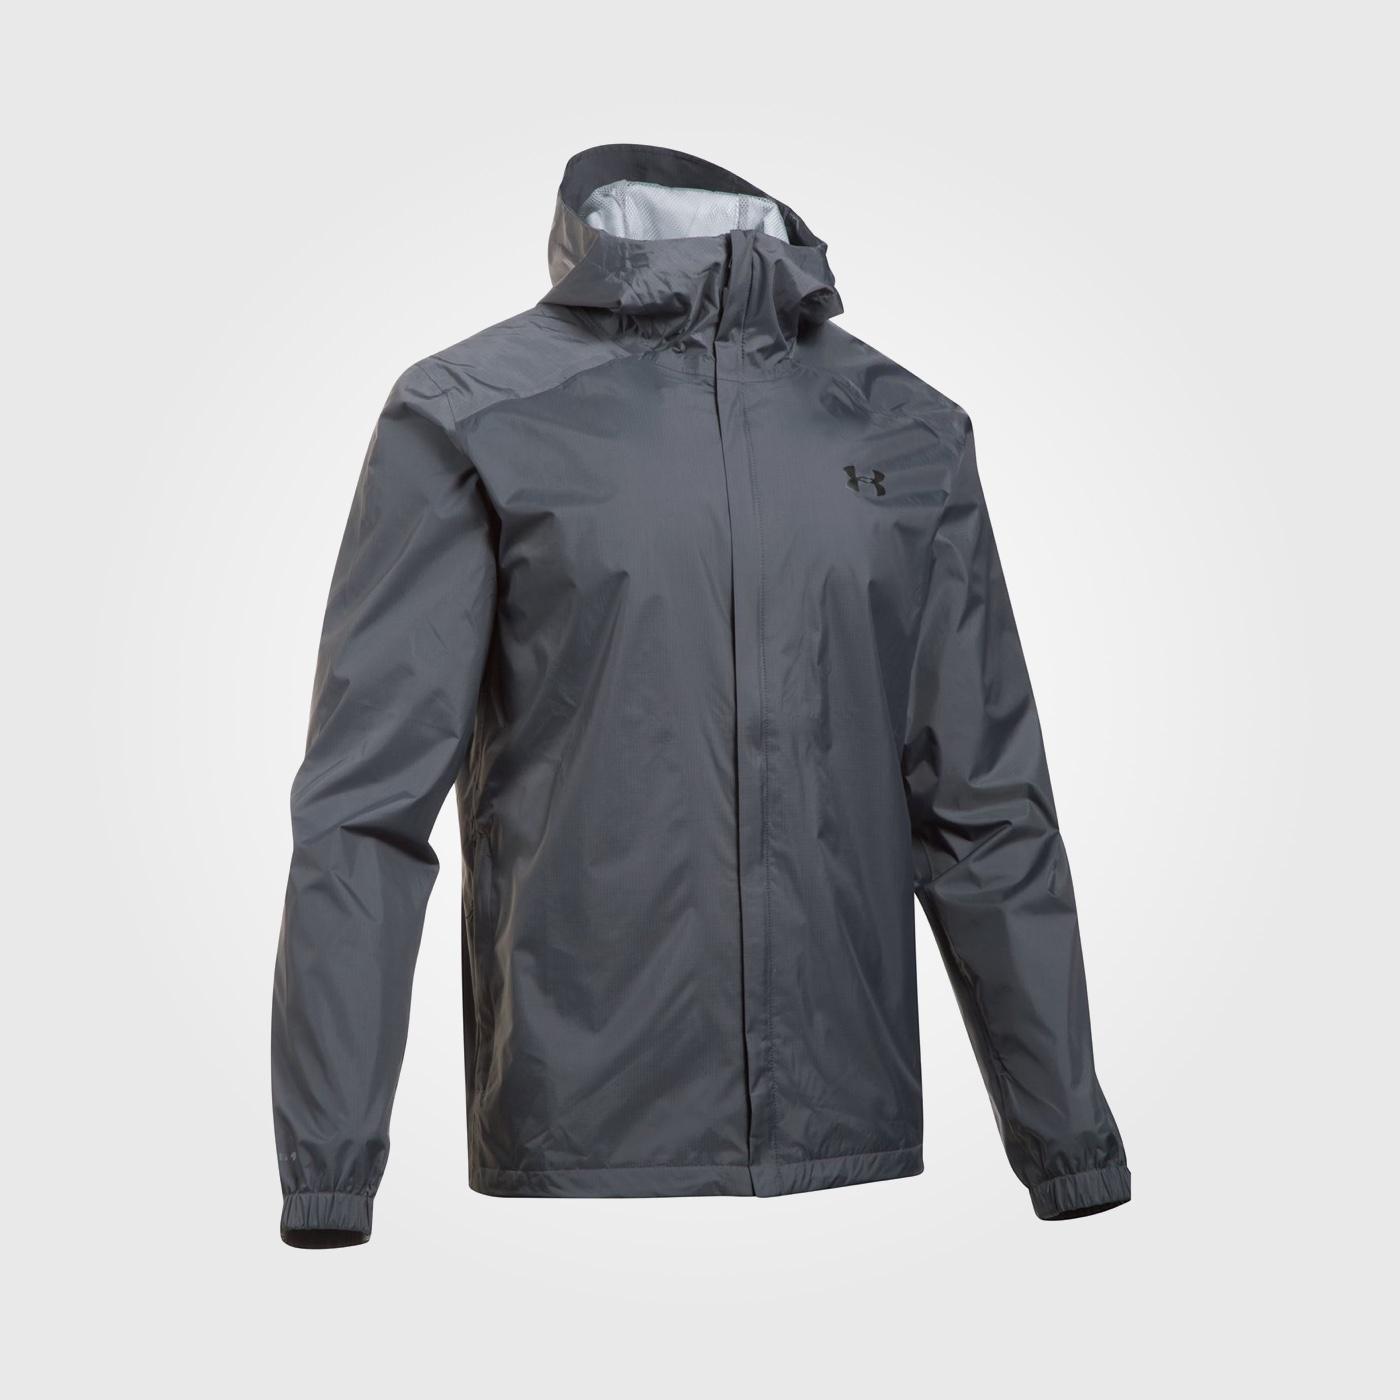 Куртка Under Armour 1292014 SnrC99 Gray